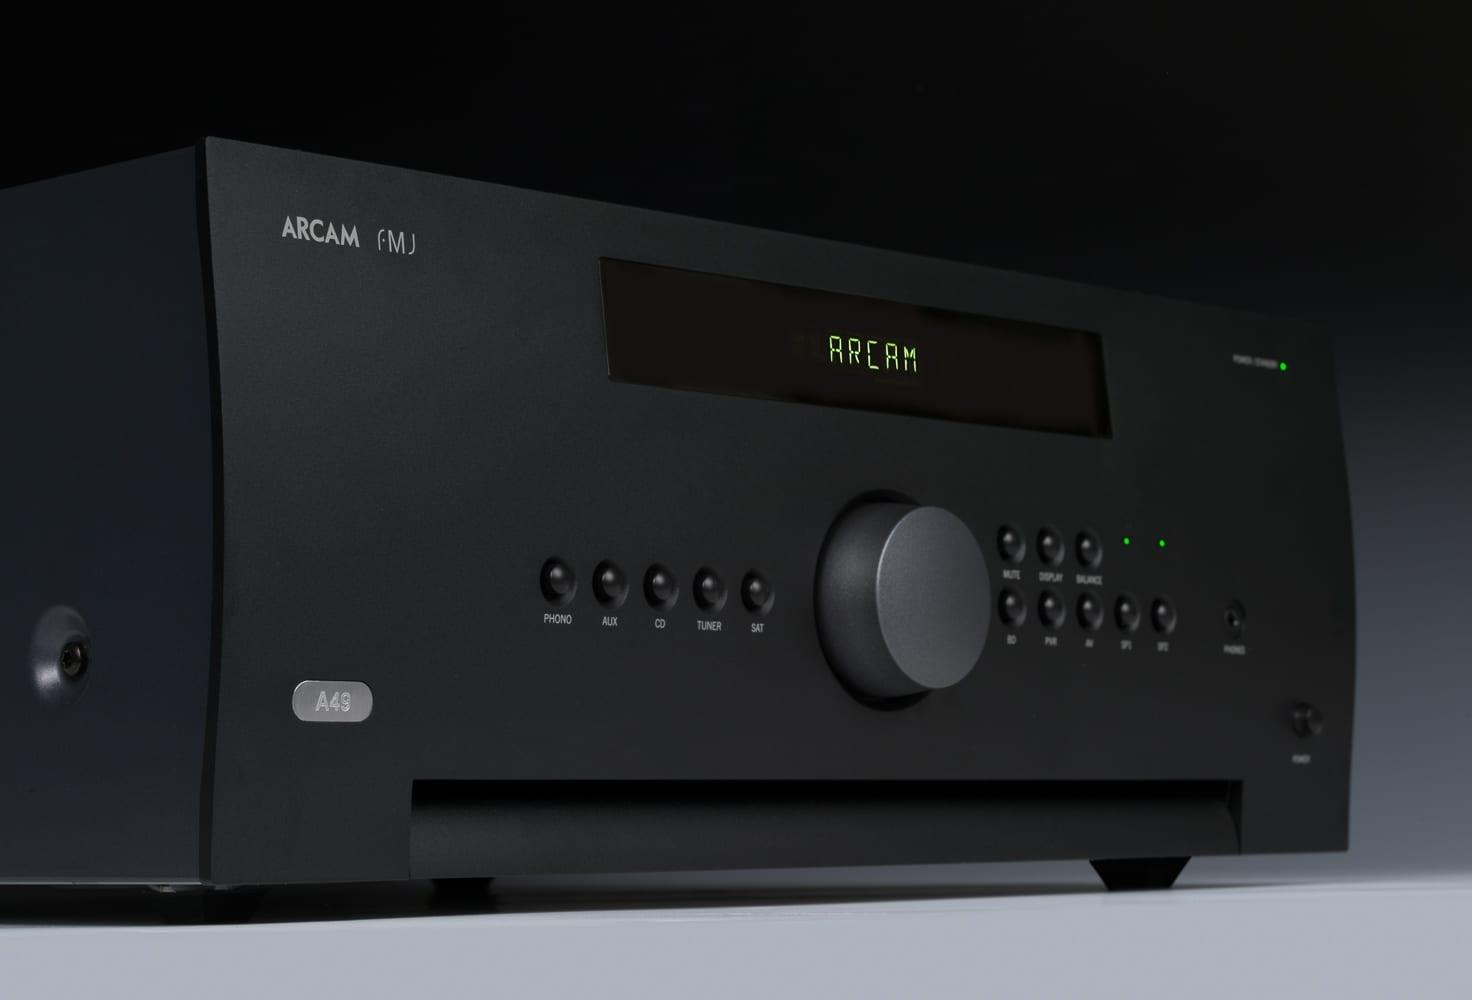 Arcam FMJ A49 Integrated Amplifier